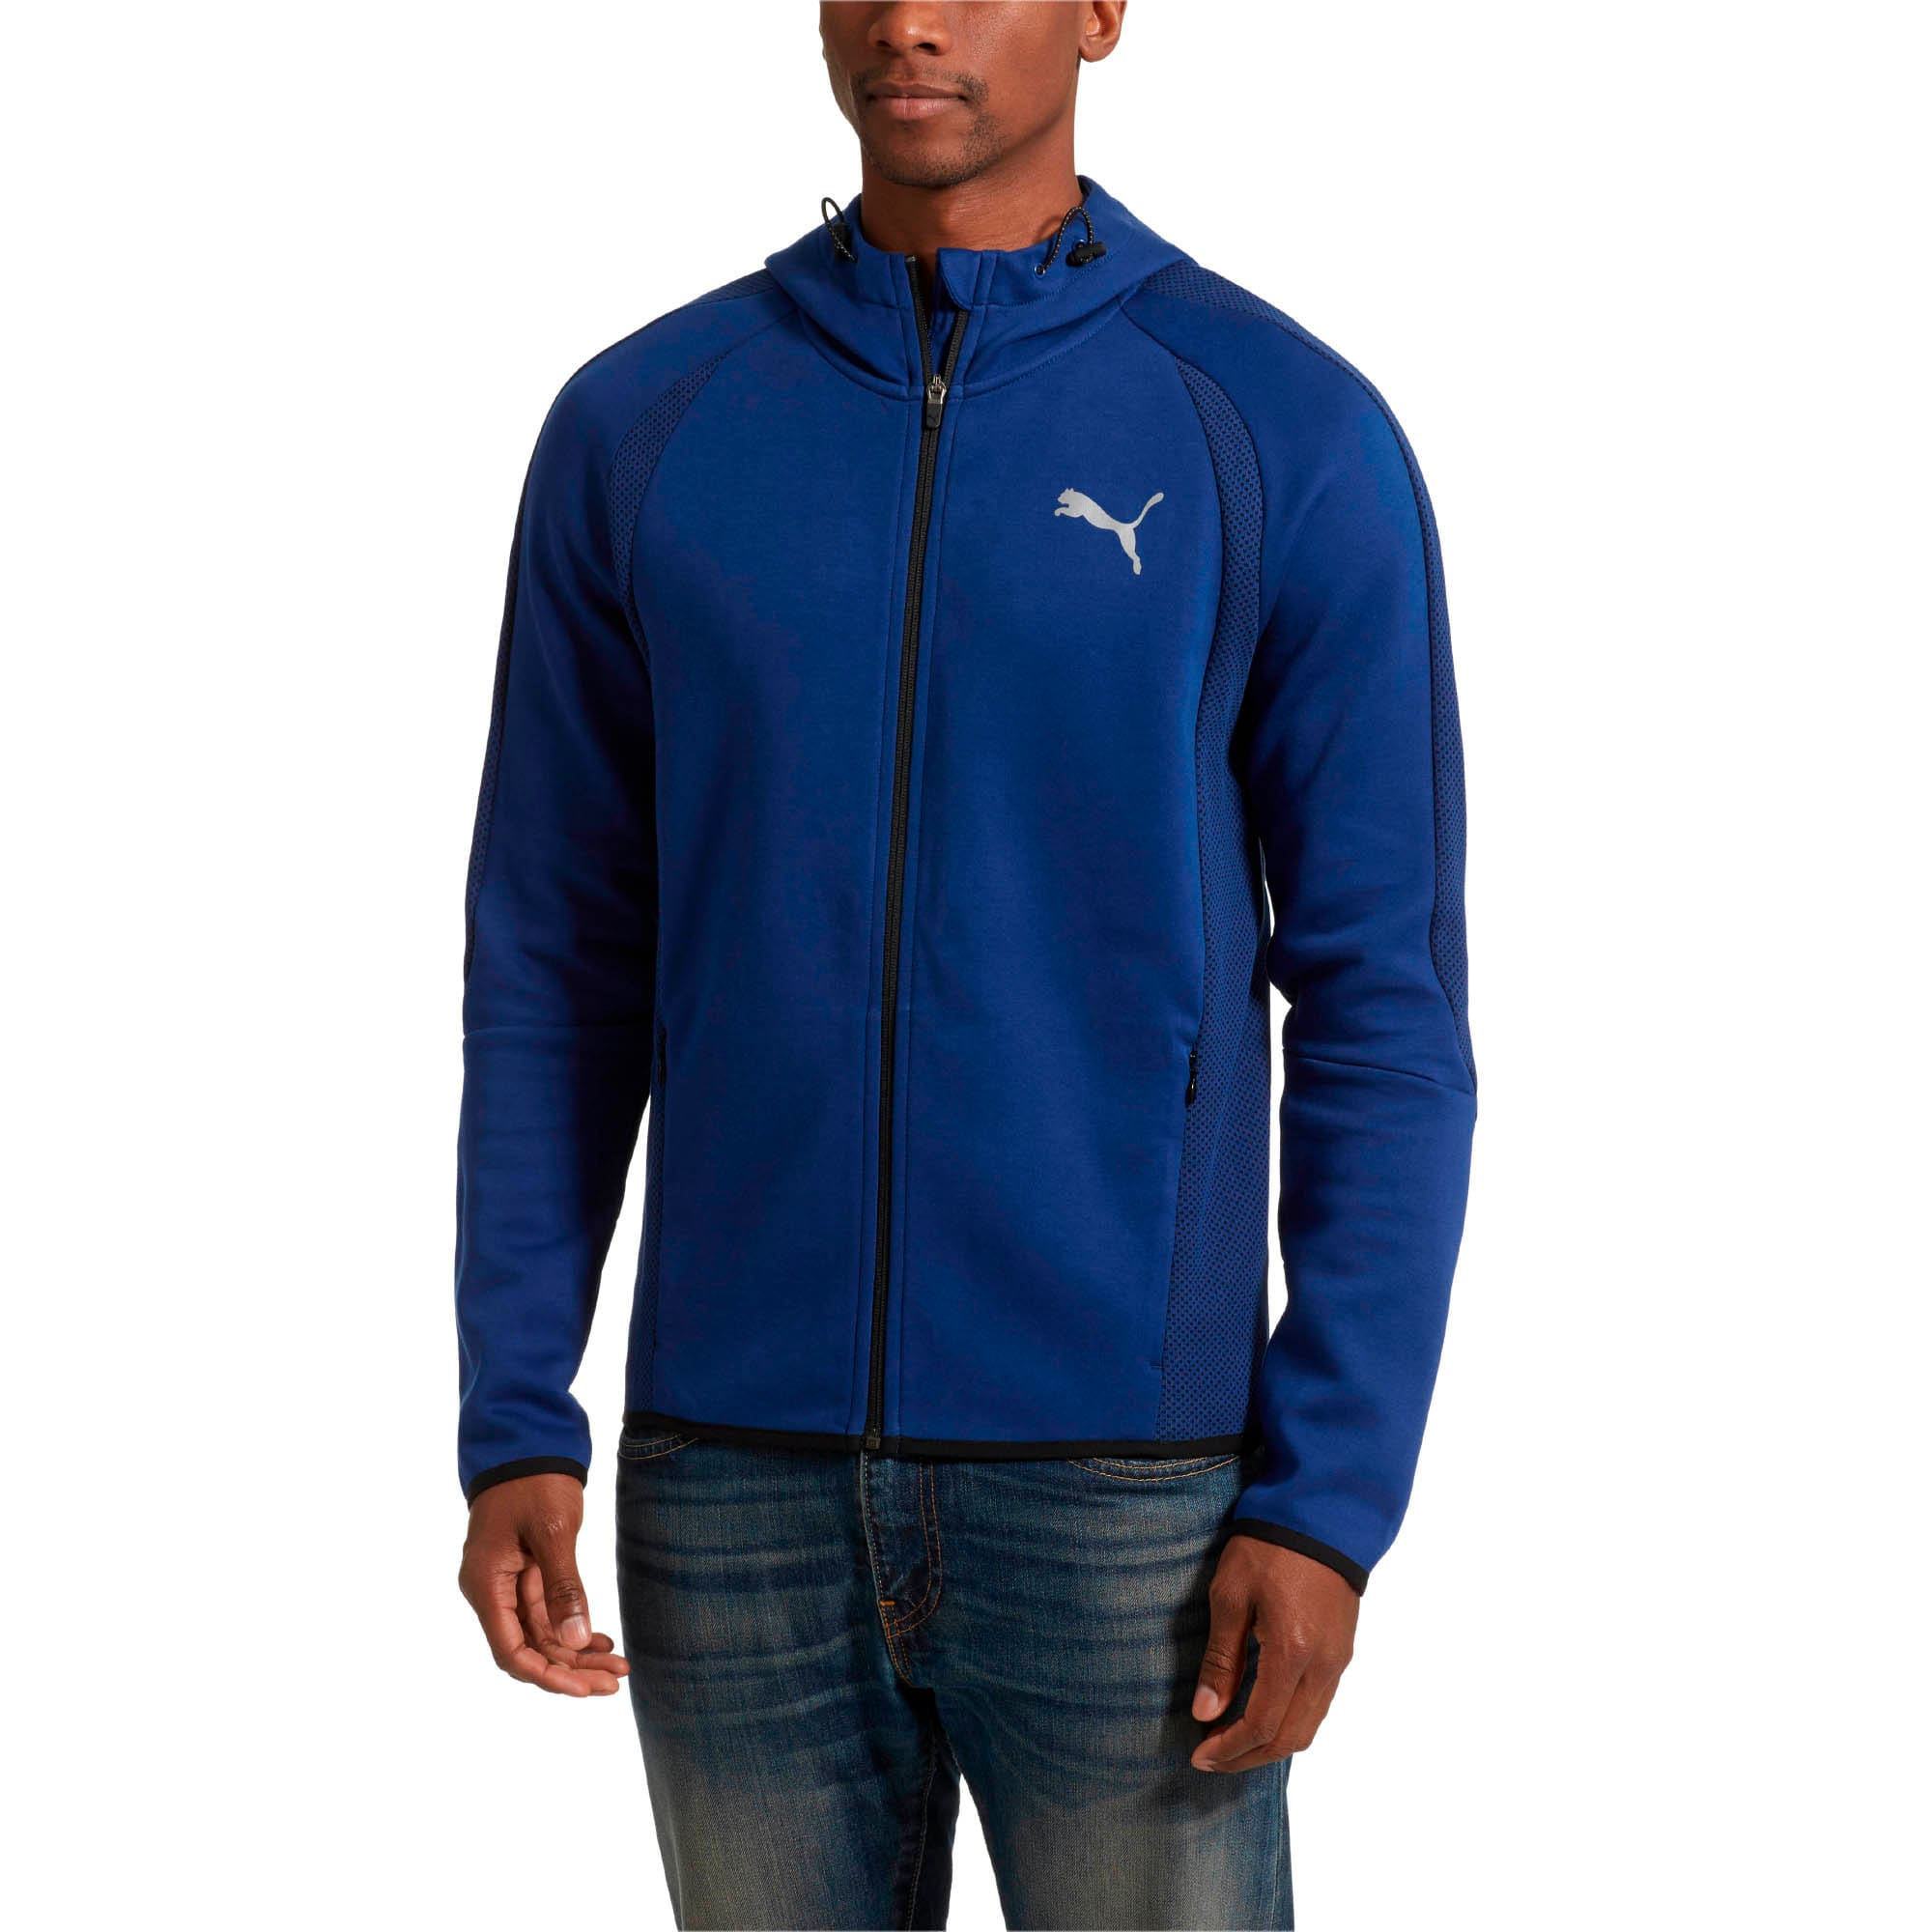 IndusHQ 204-C Short-Sleeve Unisex T-Shirt